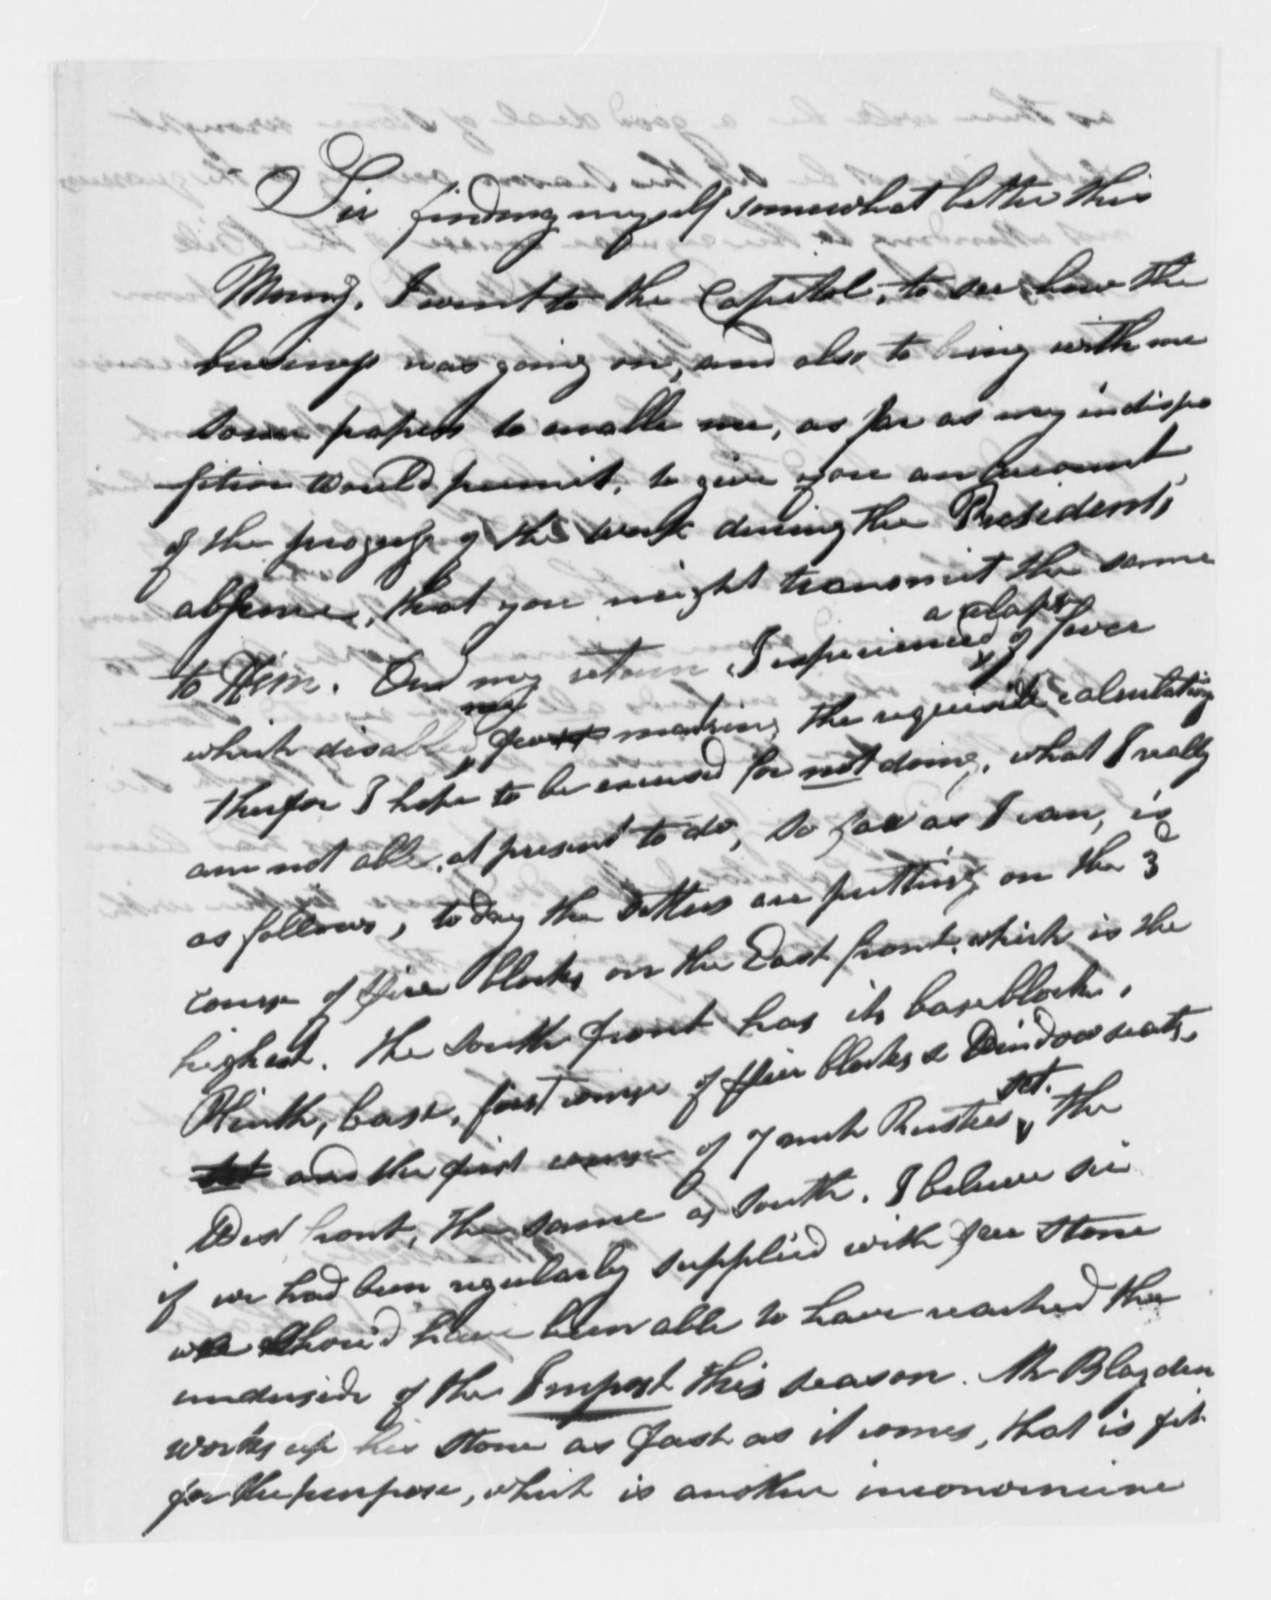 Benjamin H. Latrobe and John Lenthall to Thomas Jefferson, no date